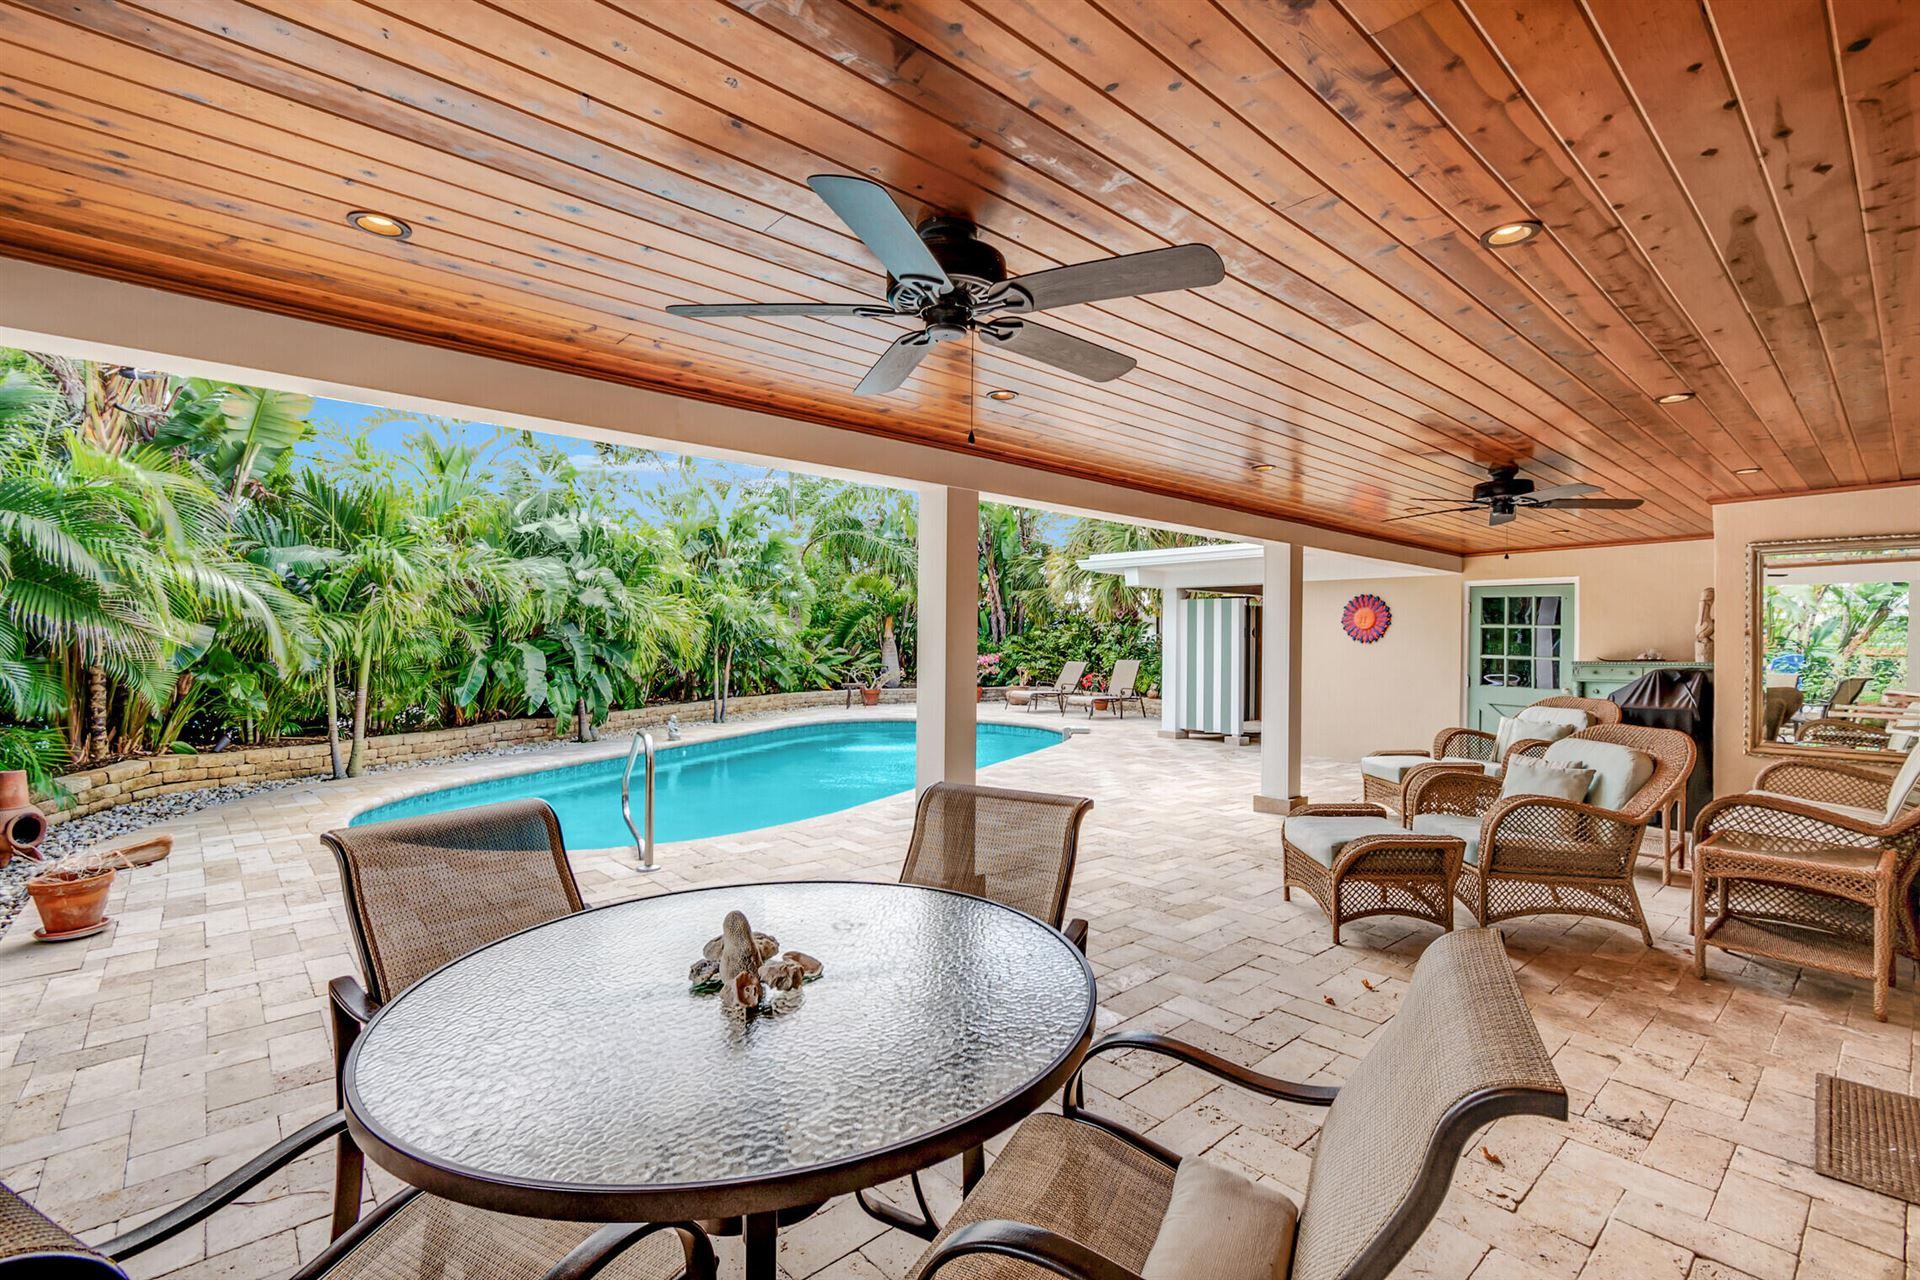 Photo of 440 Jupiter Lane, Juno Beach, FL 33408 (MLS # RX-10744648)